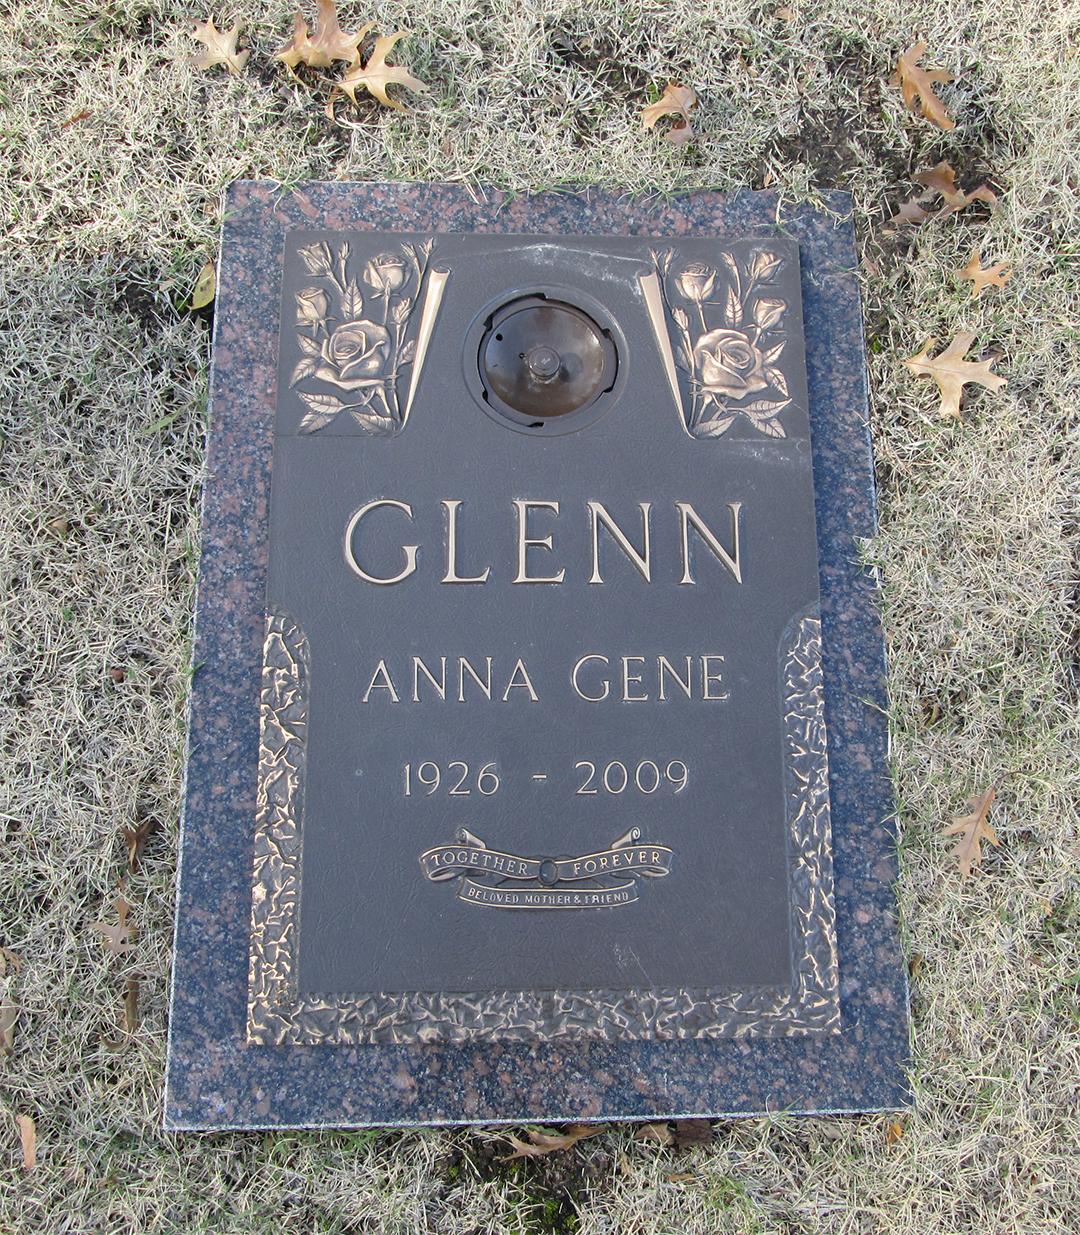 Anna Gene Glenn